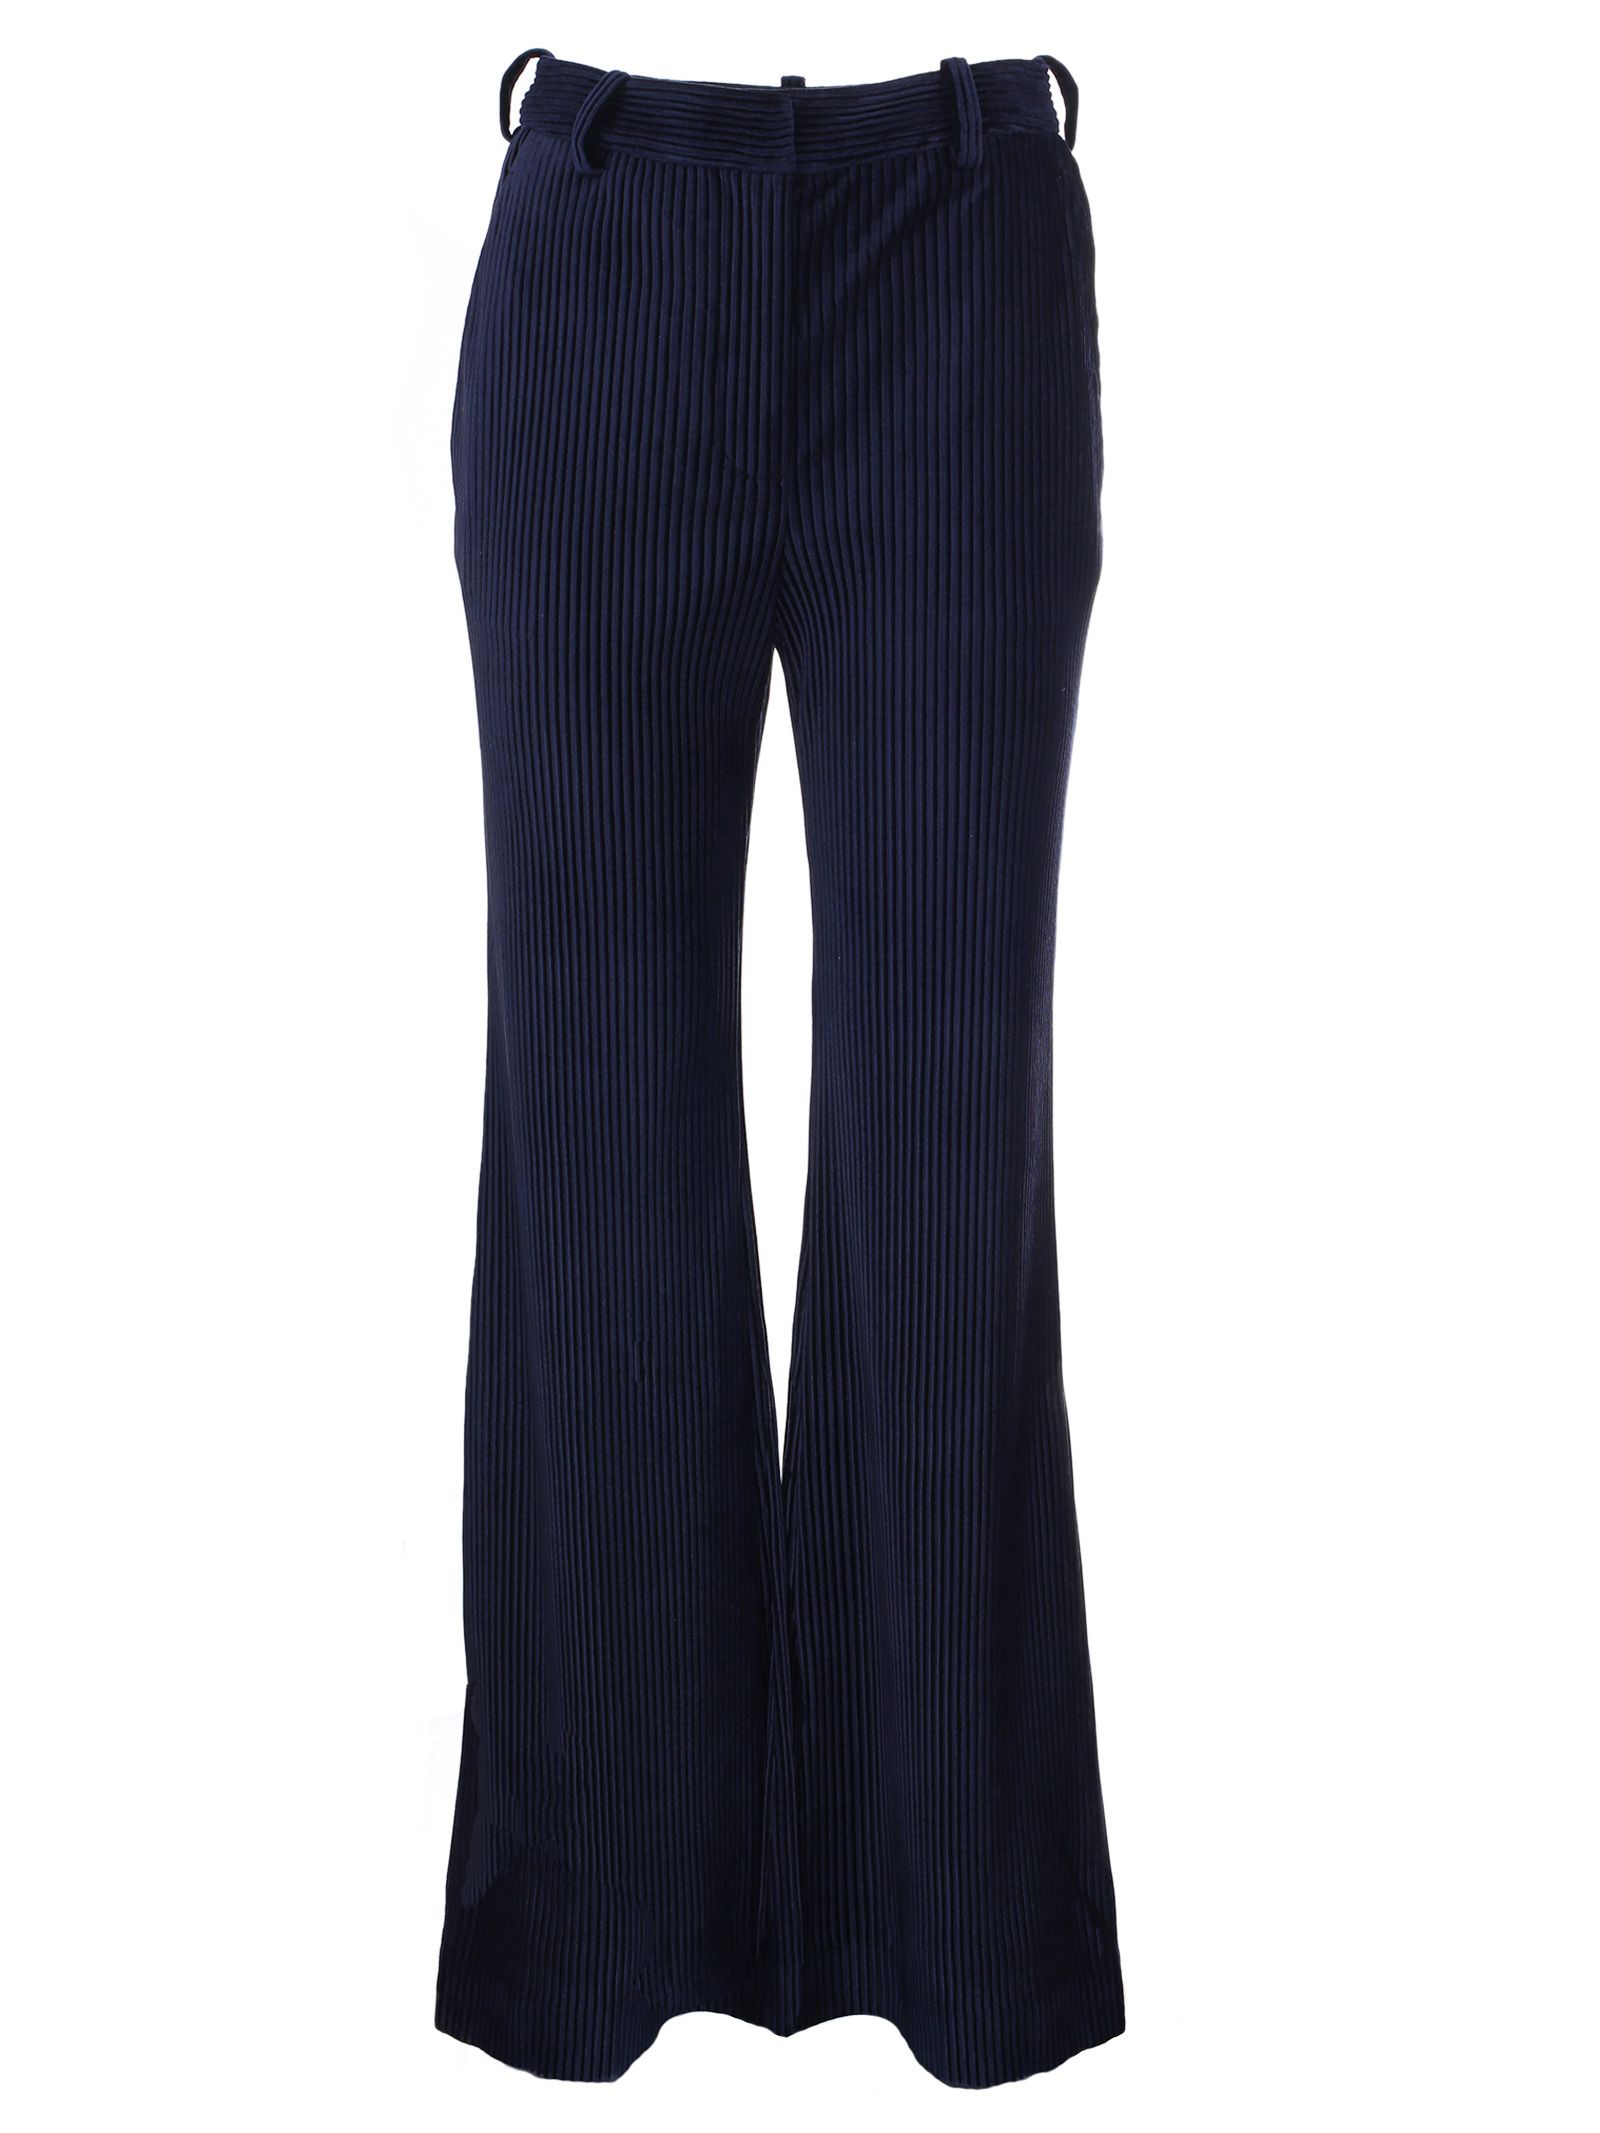 Acne Studios Tassel Cord Trousers